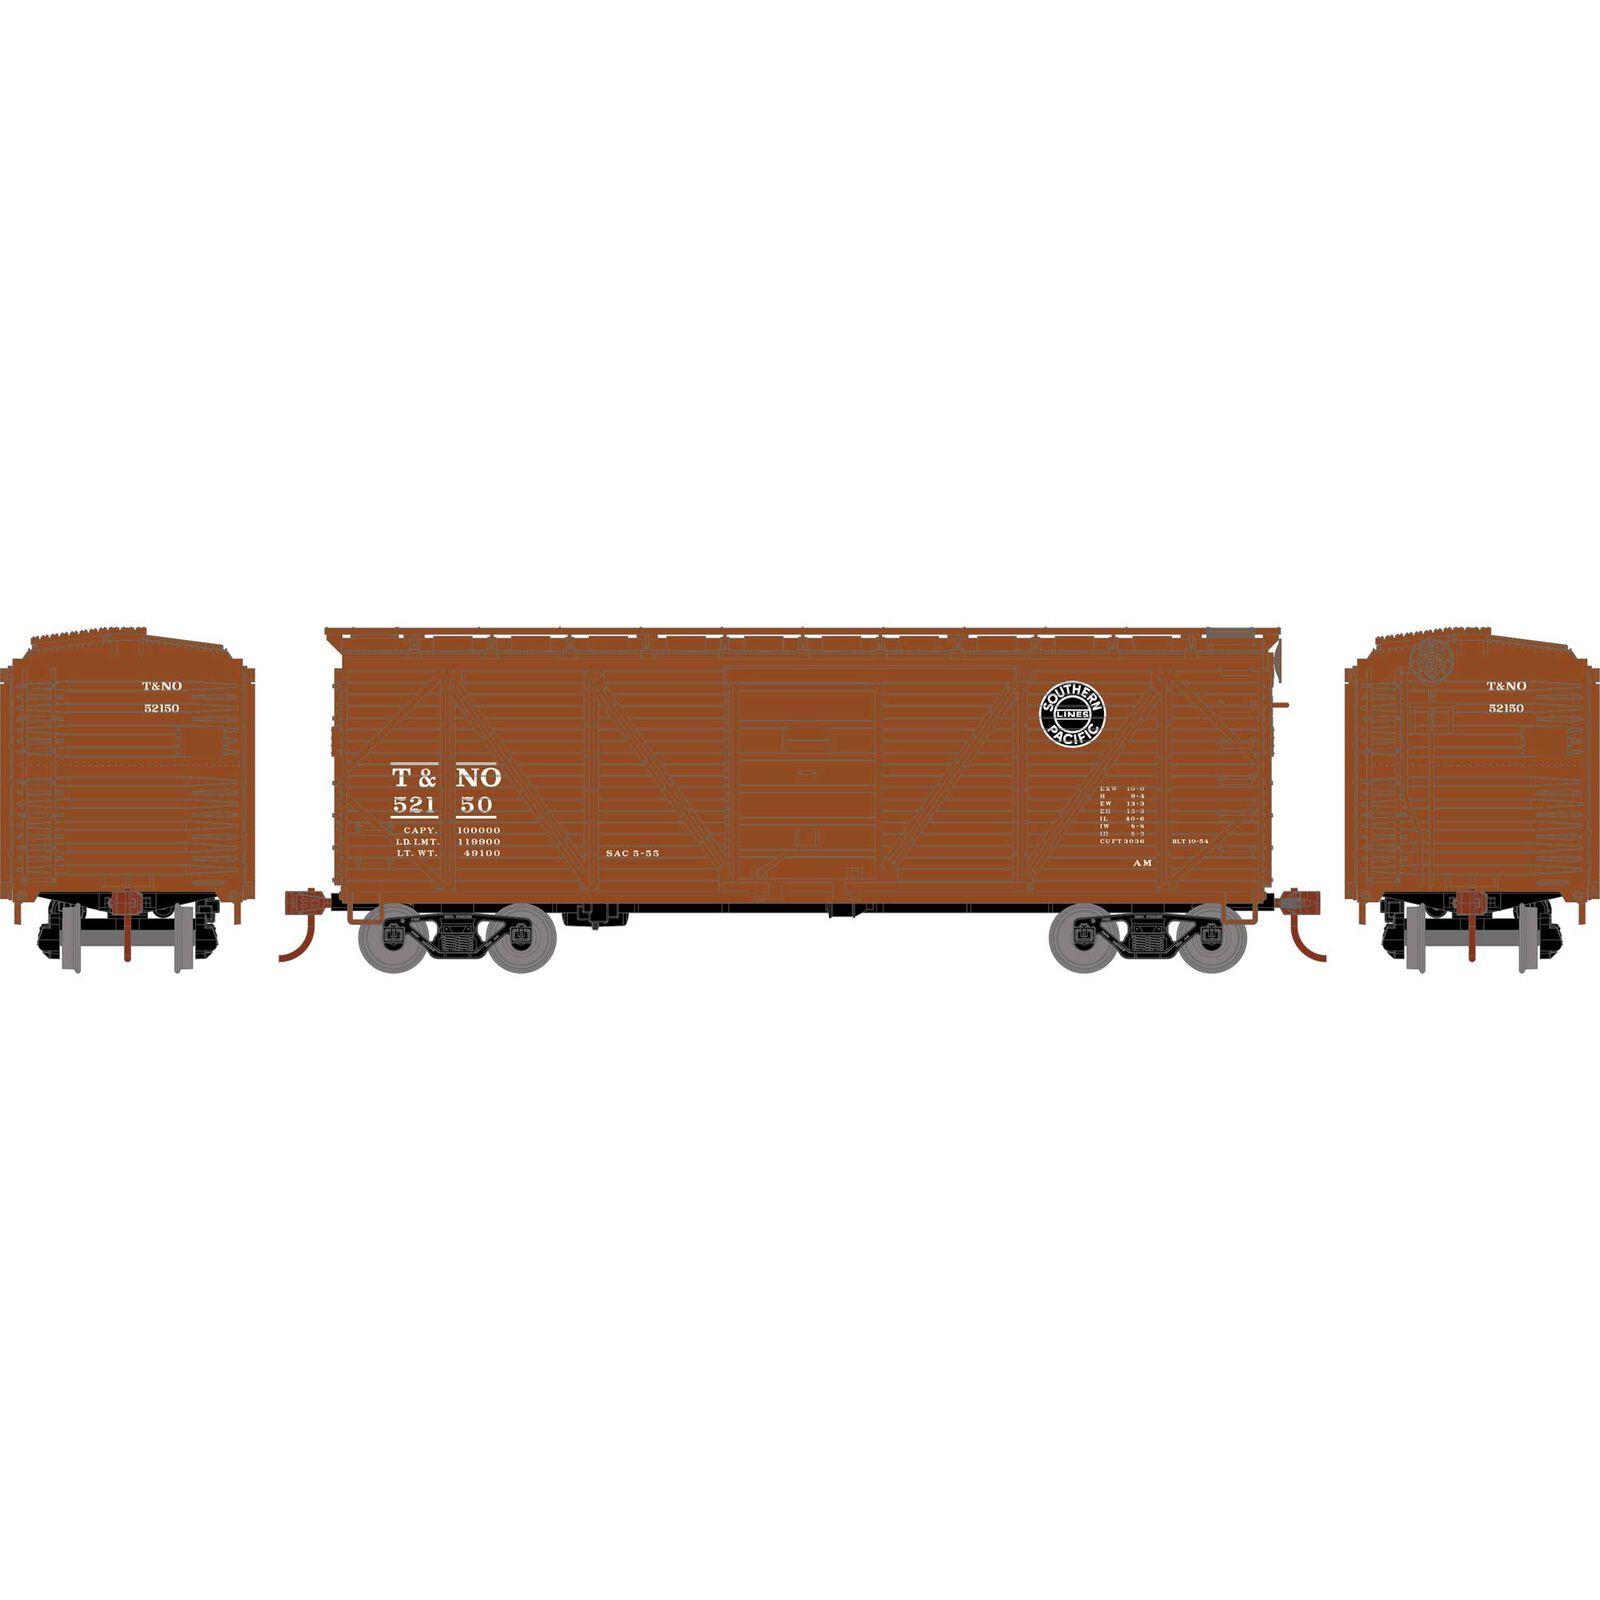 HO 40' Single Sheathed Box, T&NO #52150